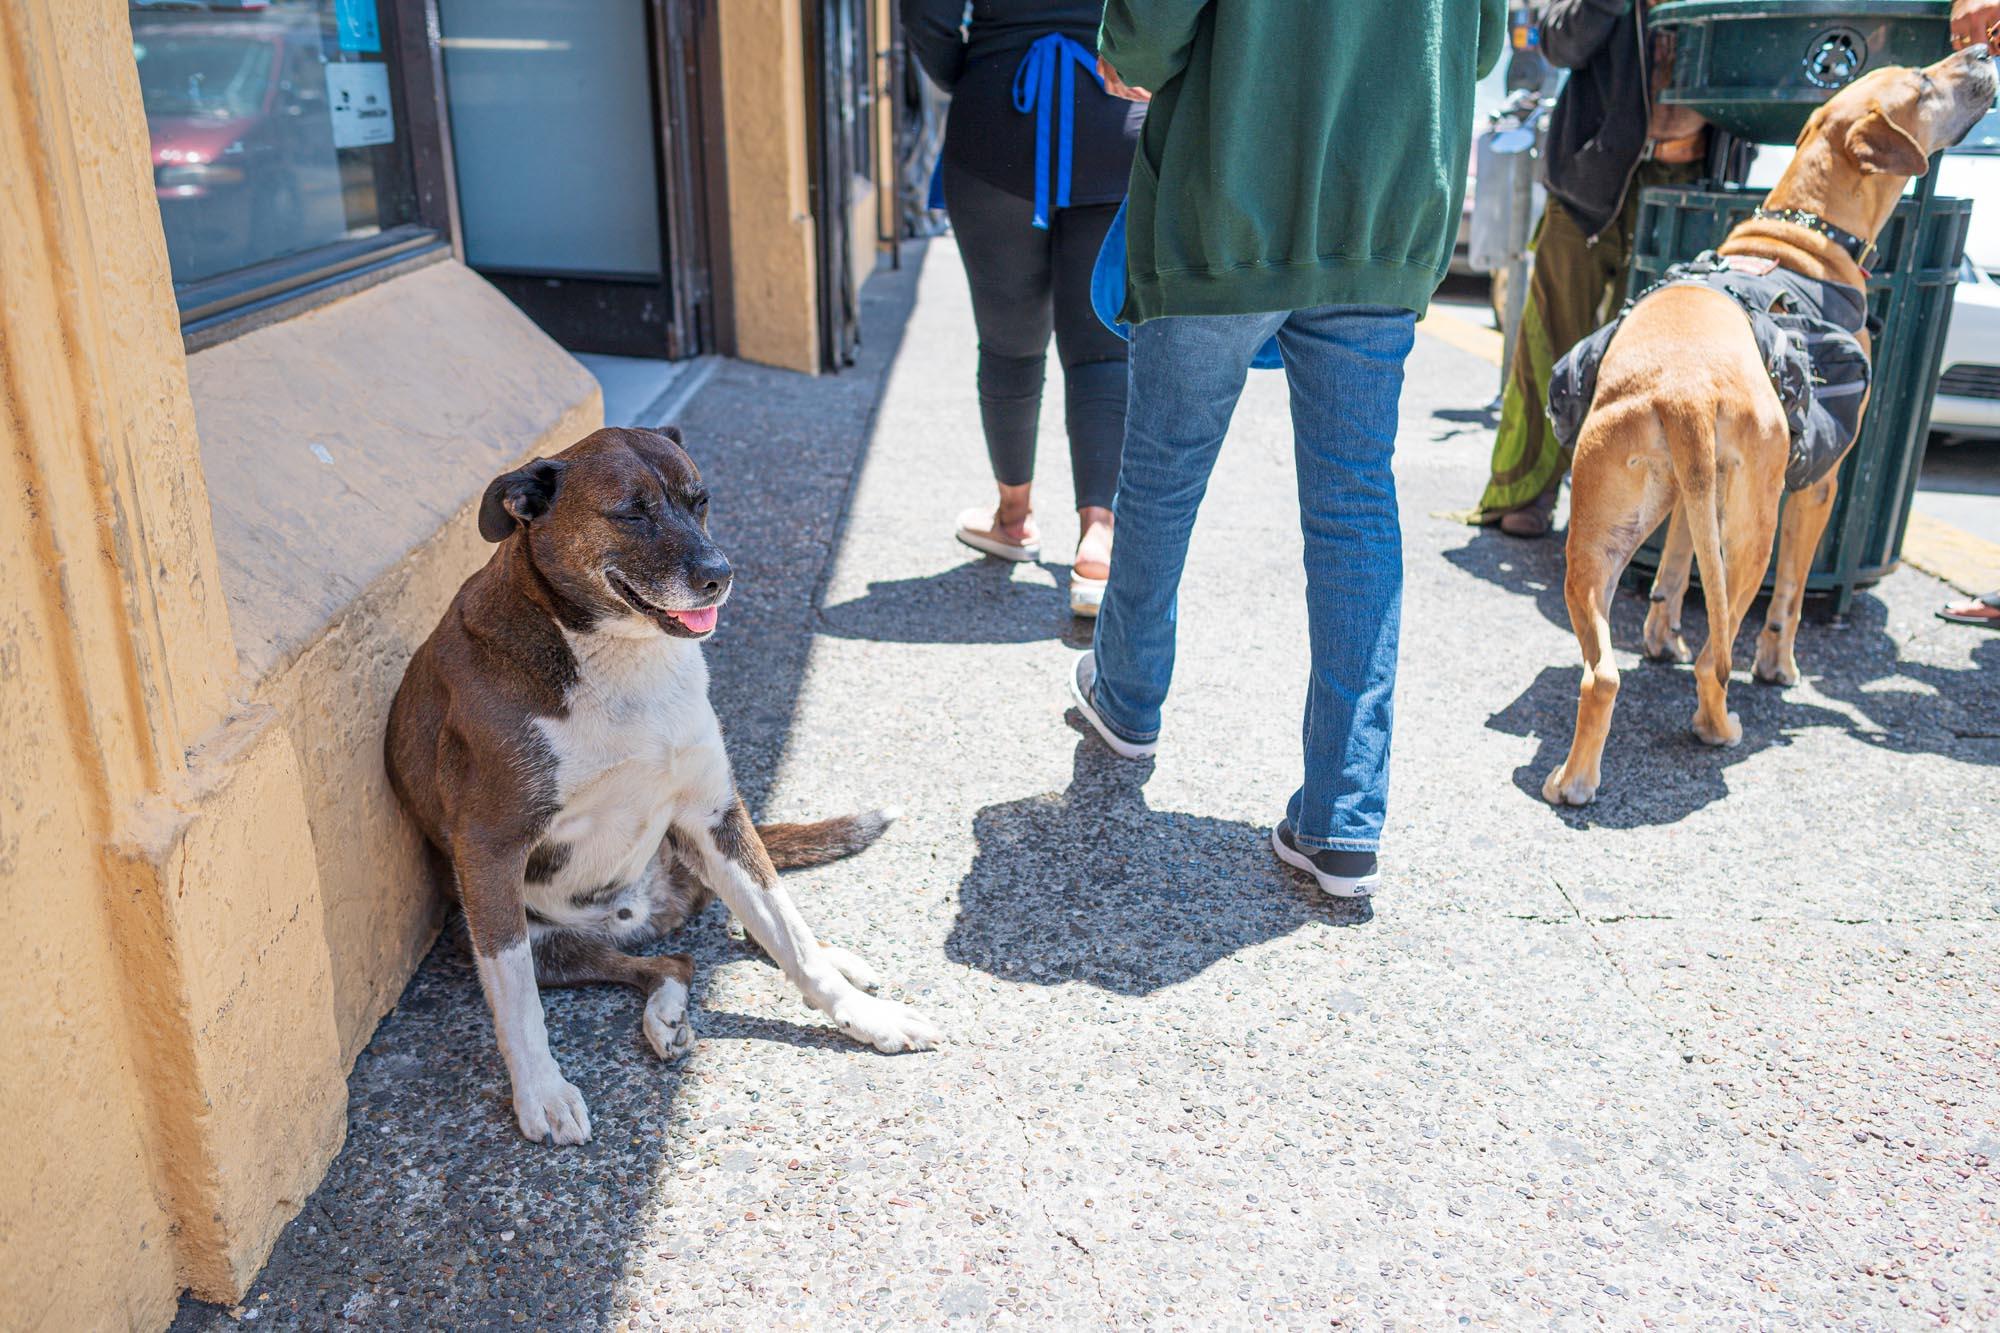 a dog sits on the sidewalk in Berkeley, California